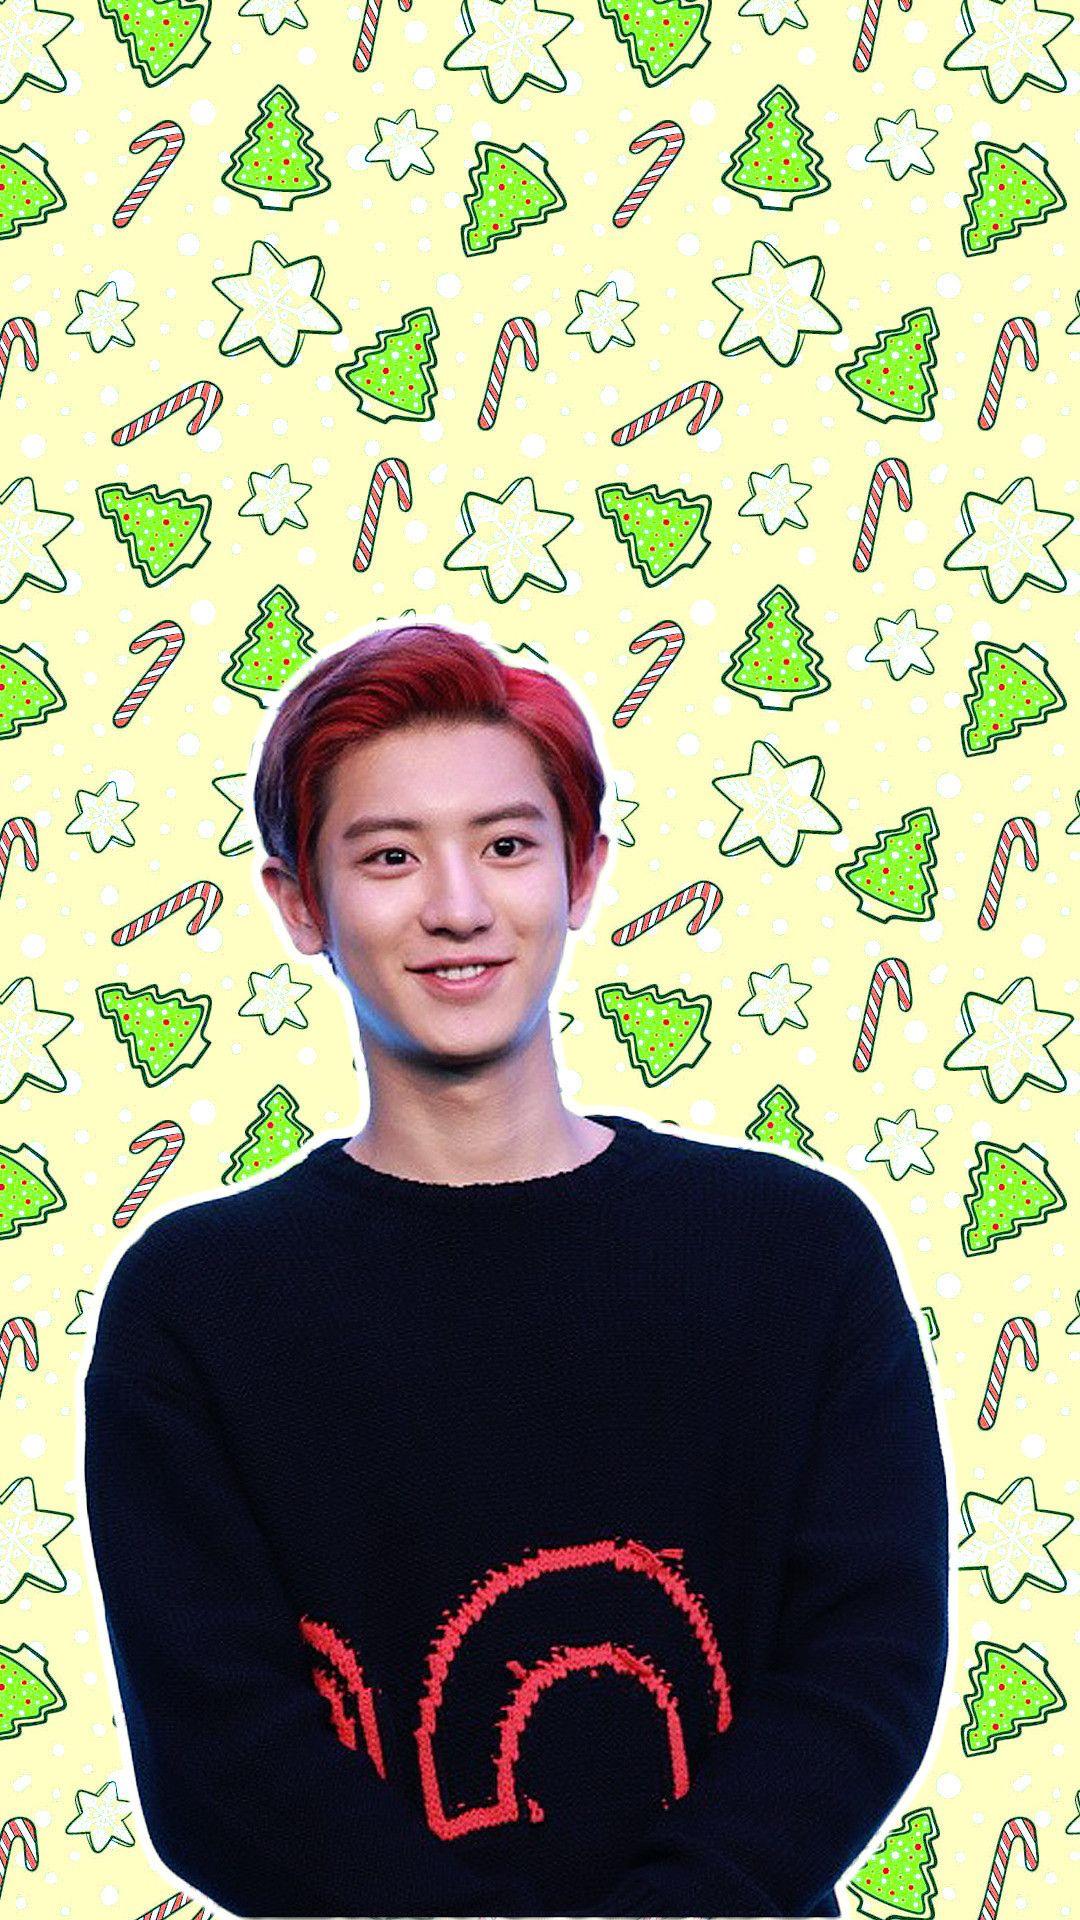 1080x1920 Exo Chanyeol Park Chanyeol Exo Wallpaper Exo Lockscreen Chanyeol Wallpaper Chanyeol Lockscreen Kpop Christmas Chanyeol Wallpaper Christmas Wallpaper